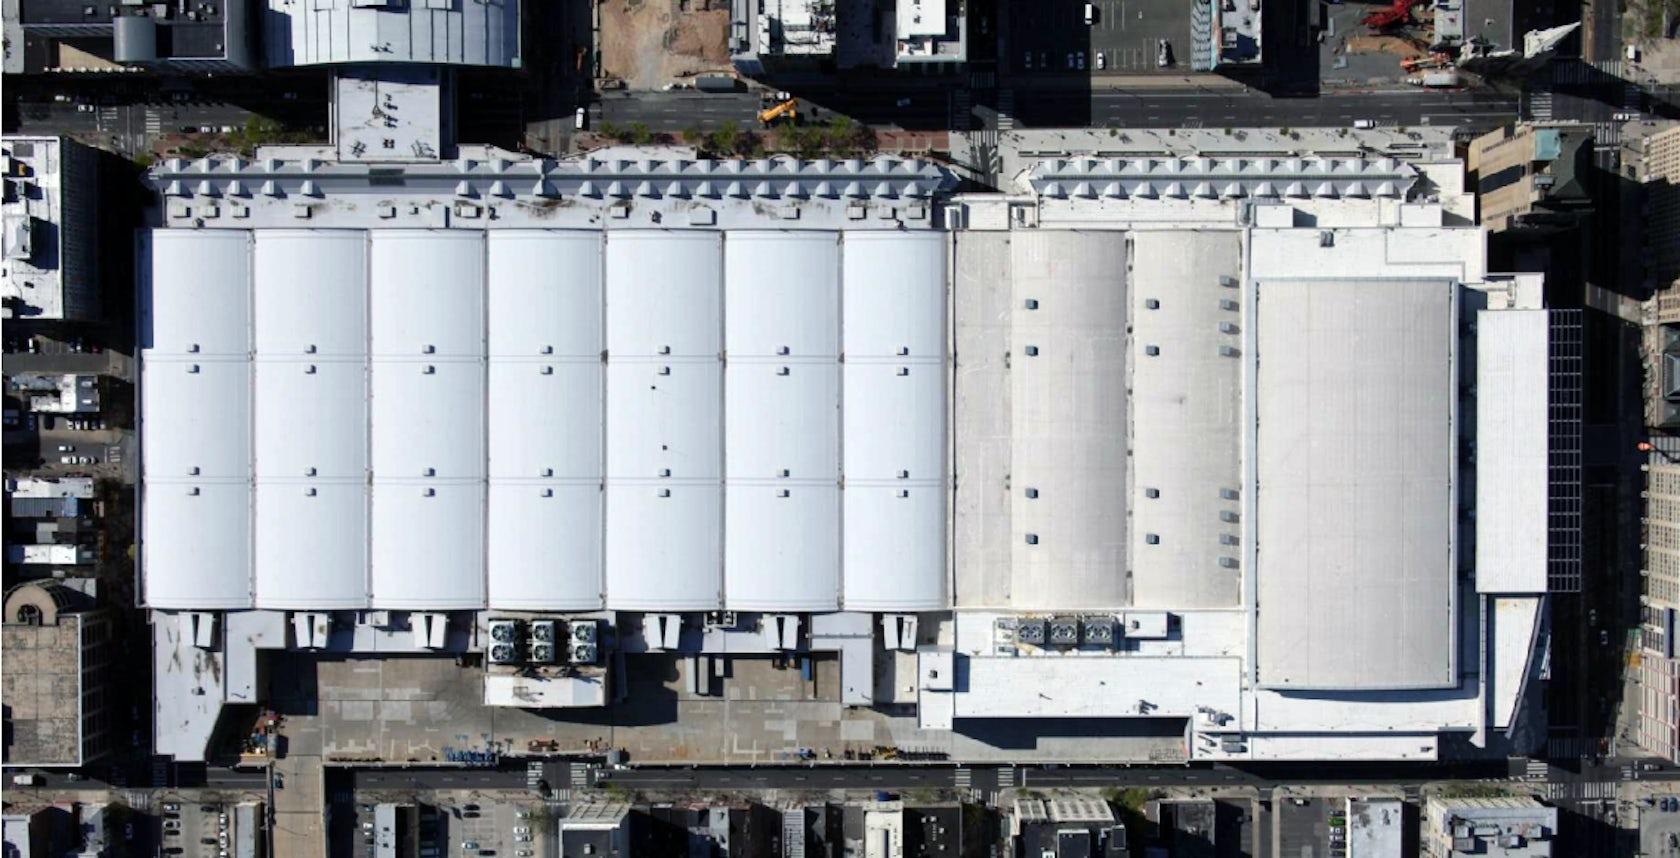 Pennsylvania Convention Center Roof Design Architizer